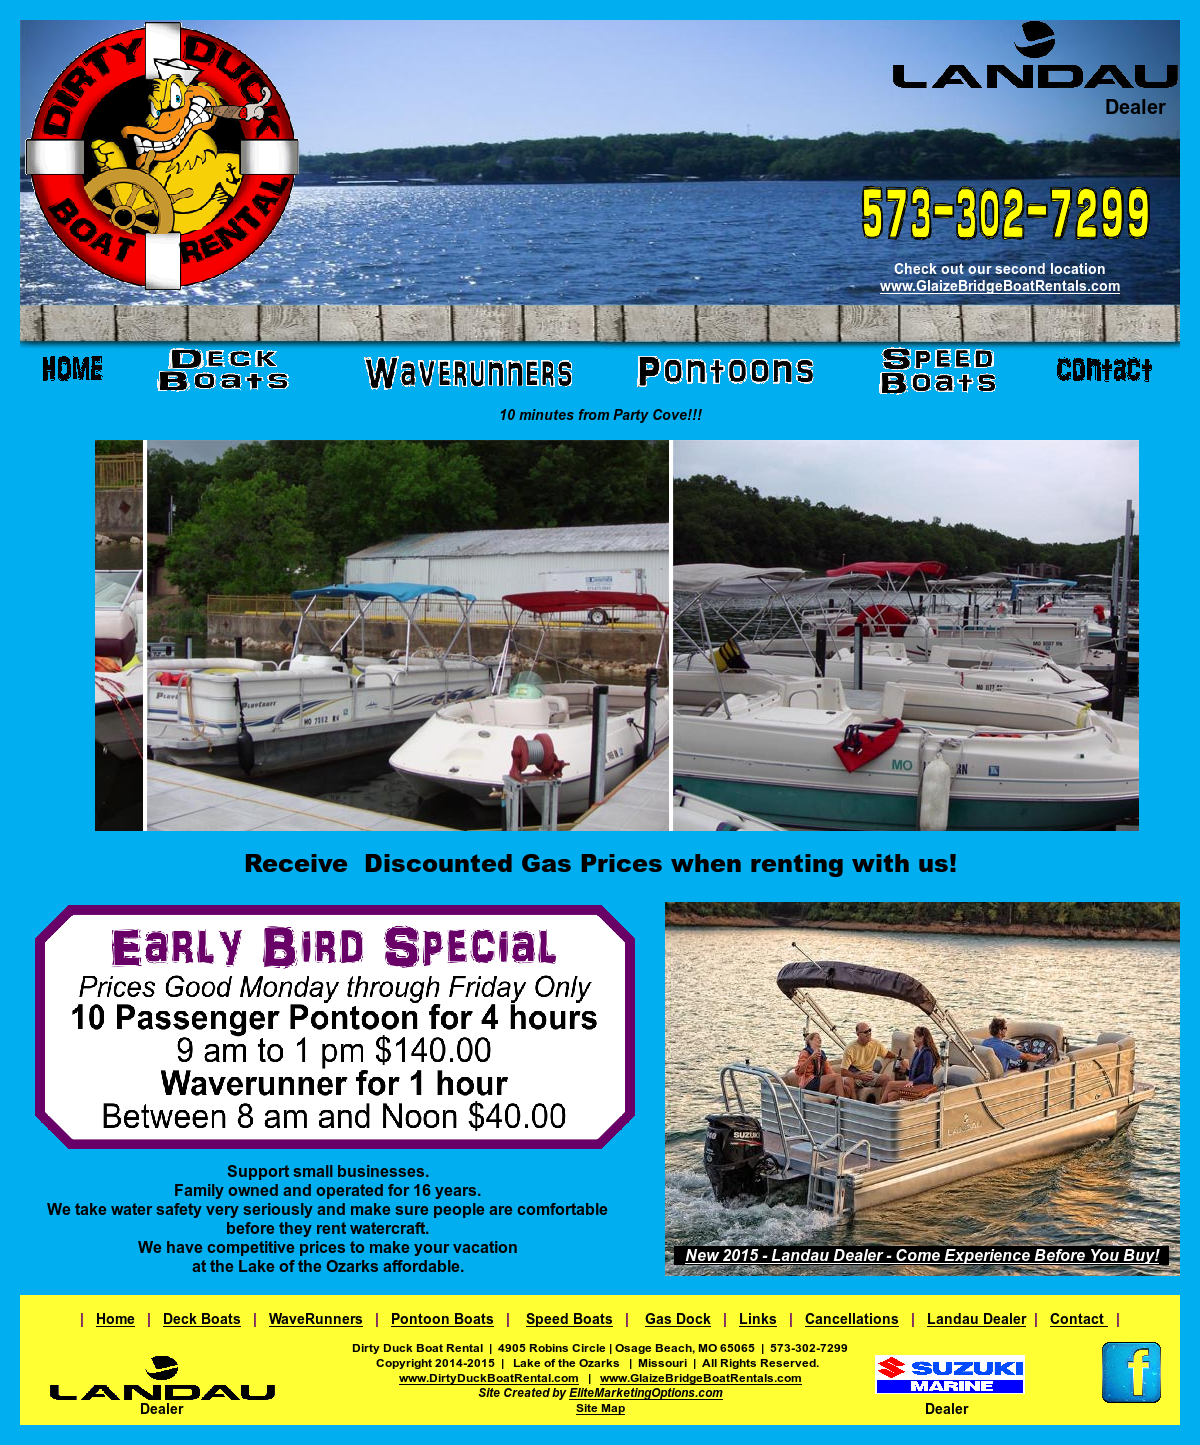 Glaize Bridge Boat Rentals Competitors Revenue And